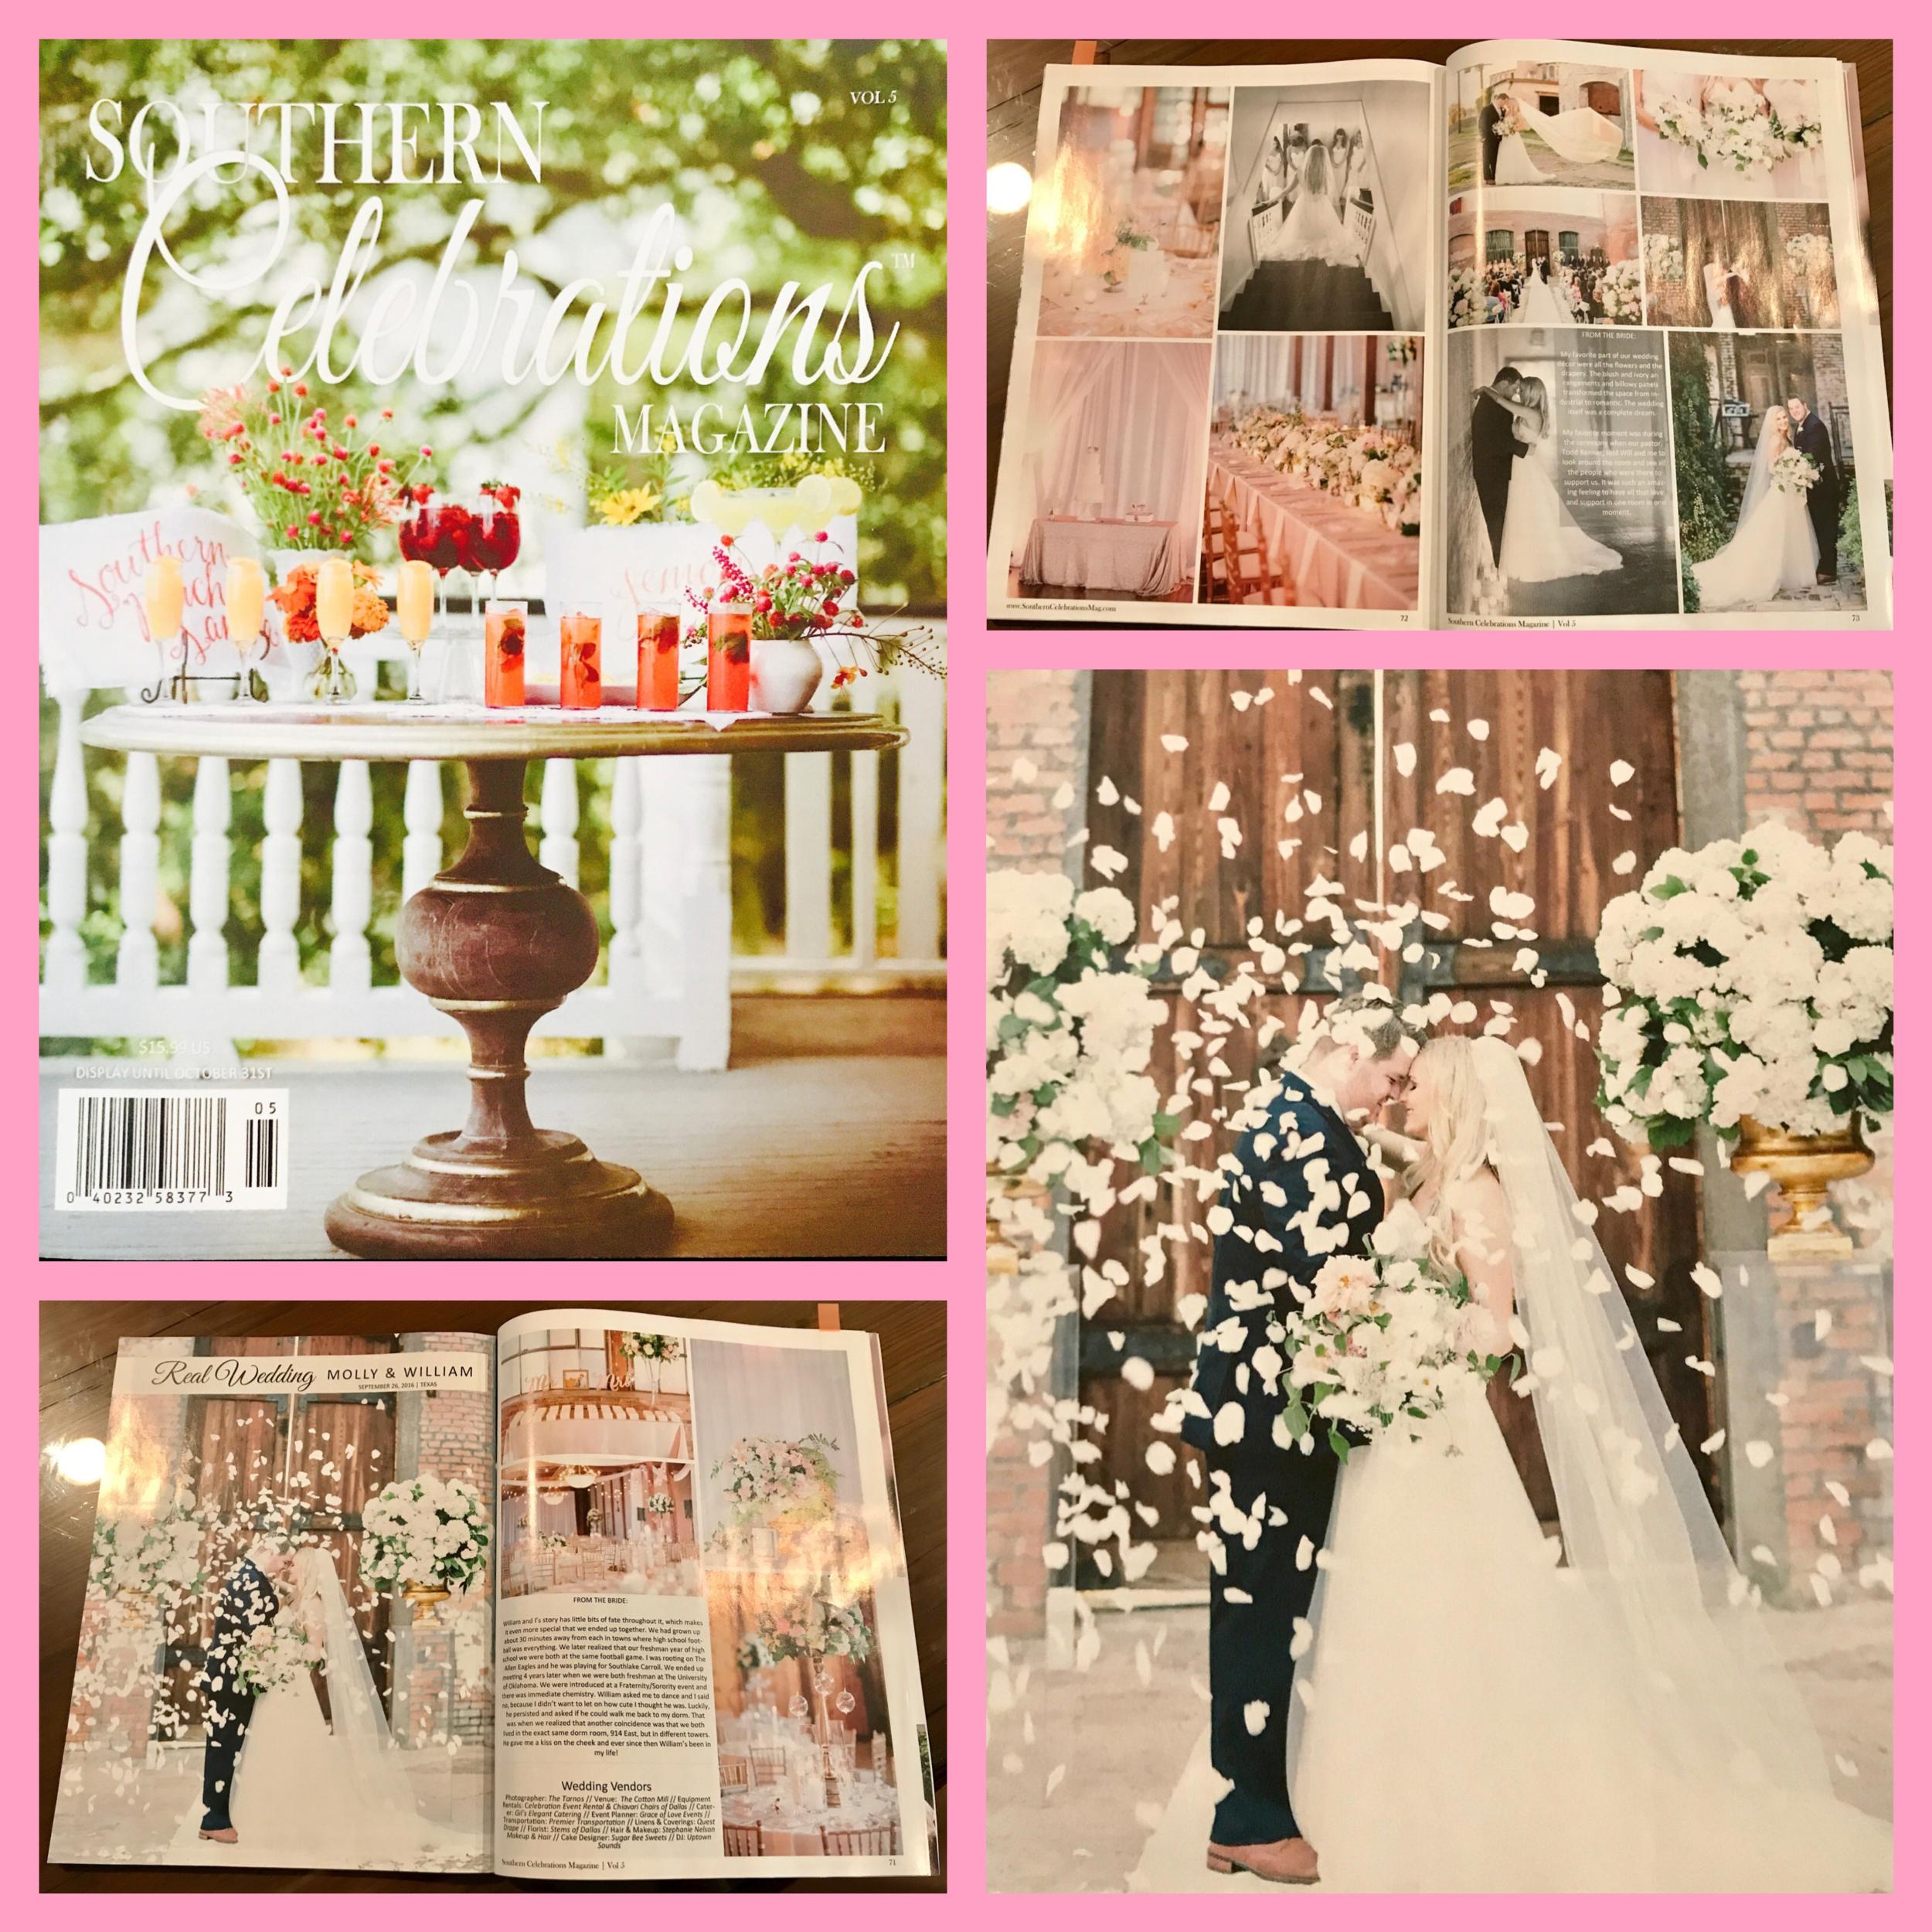 Southern Celebrations Magazine, Volume 5